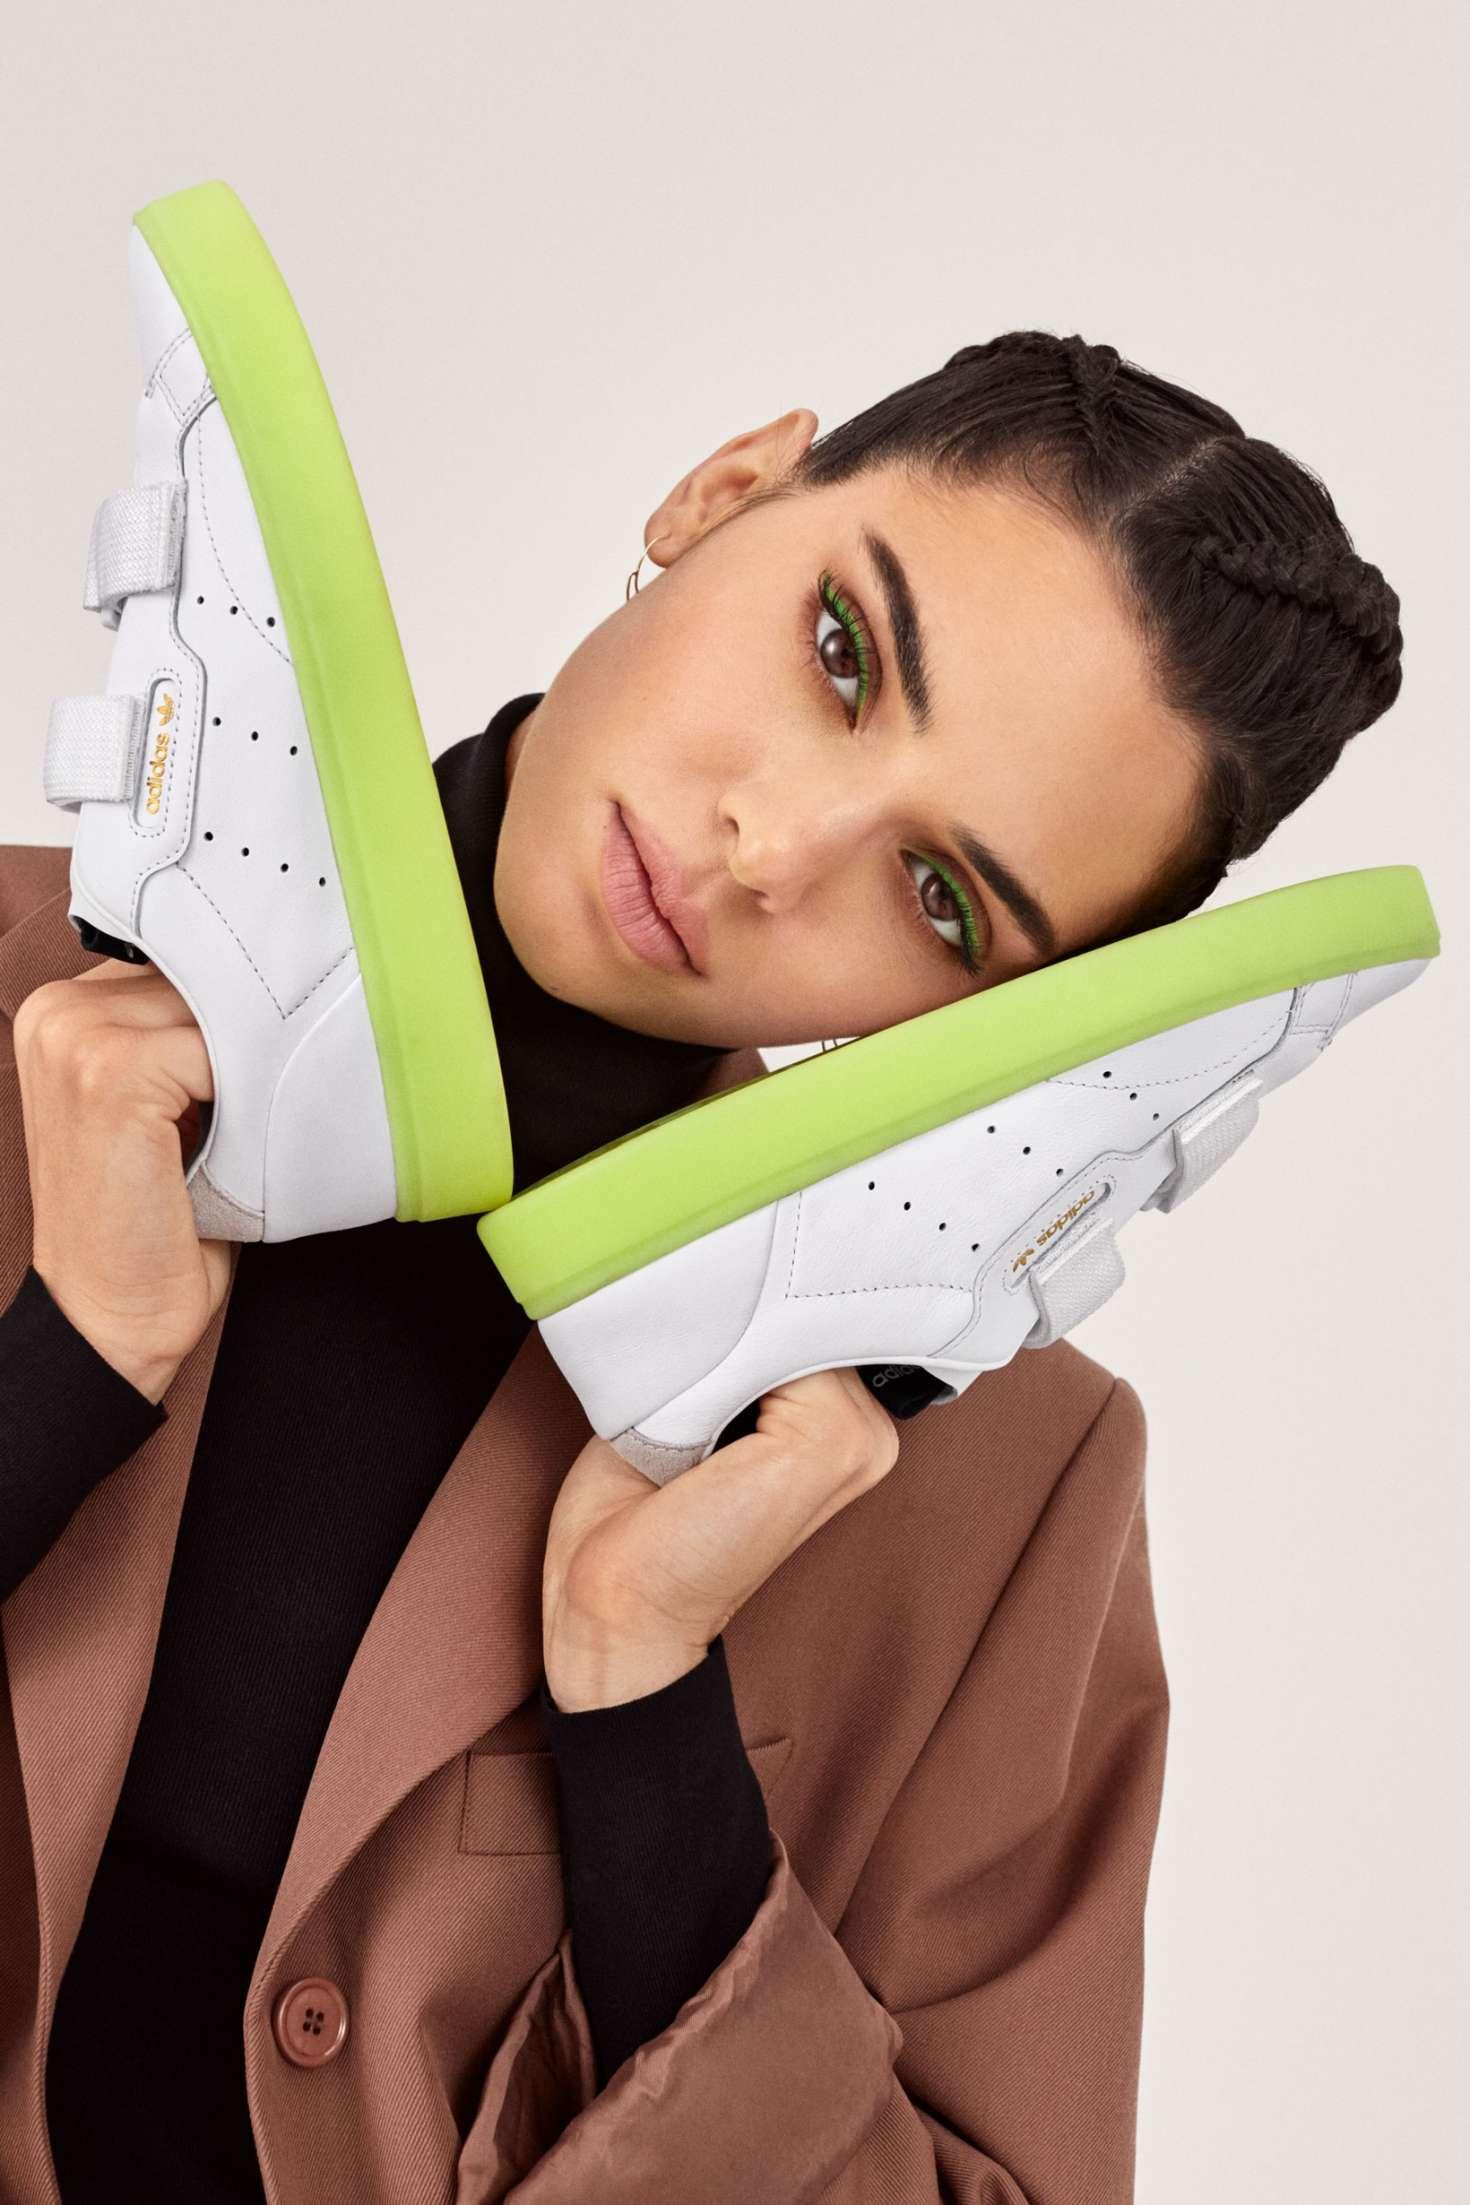 Kendall Jenner 2019 : Kendall Jenner: Adidas New Sleek Lookbook 2019 Collection -01